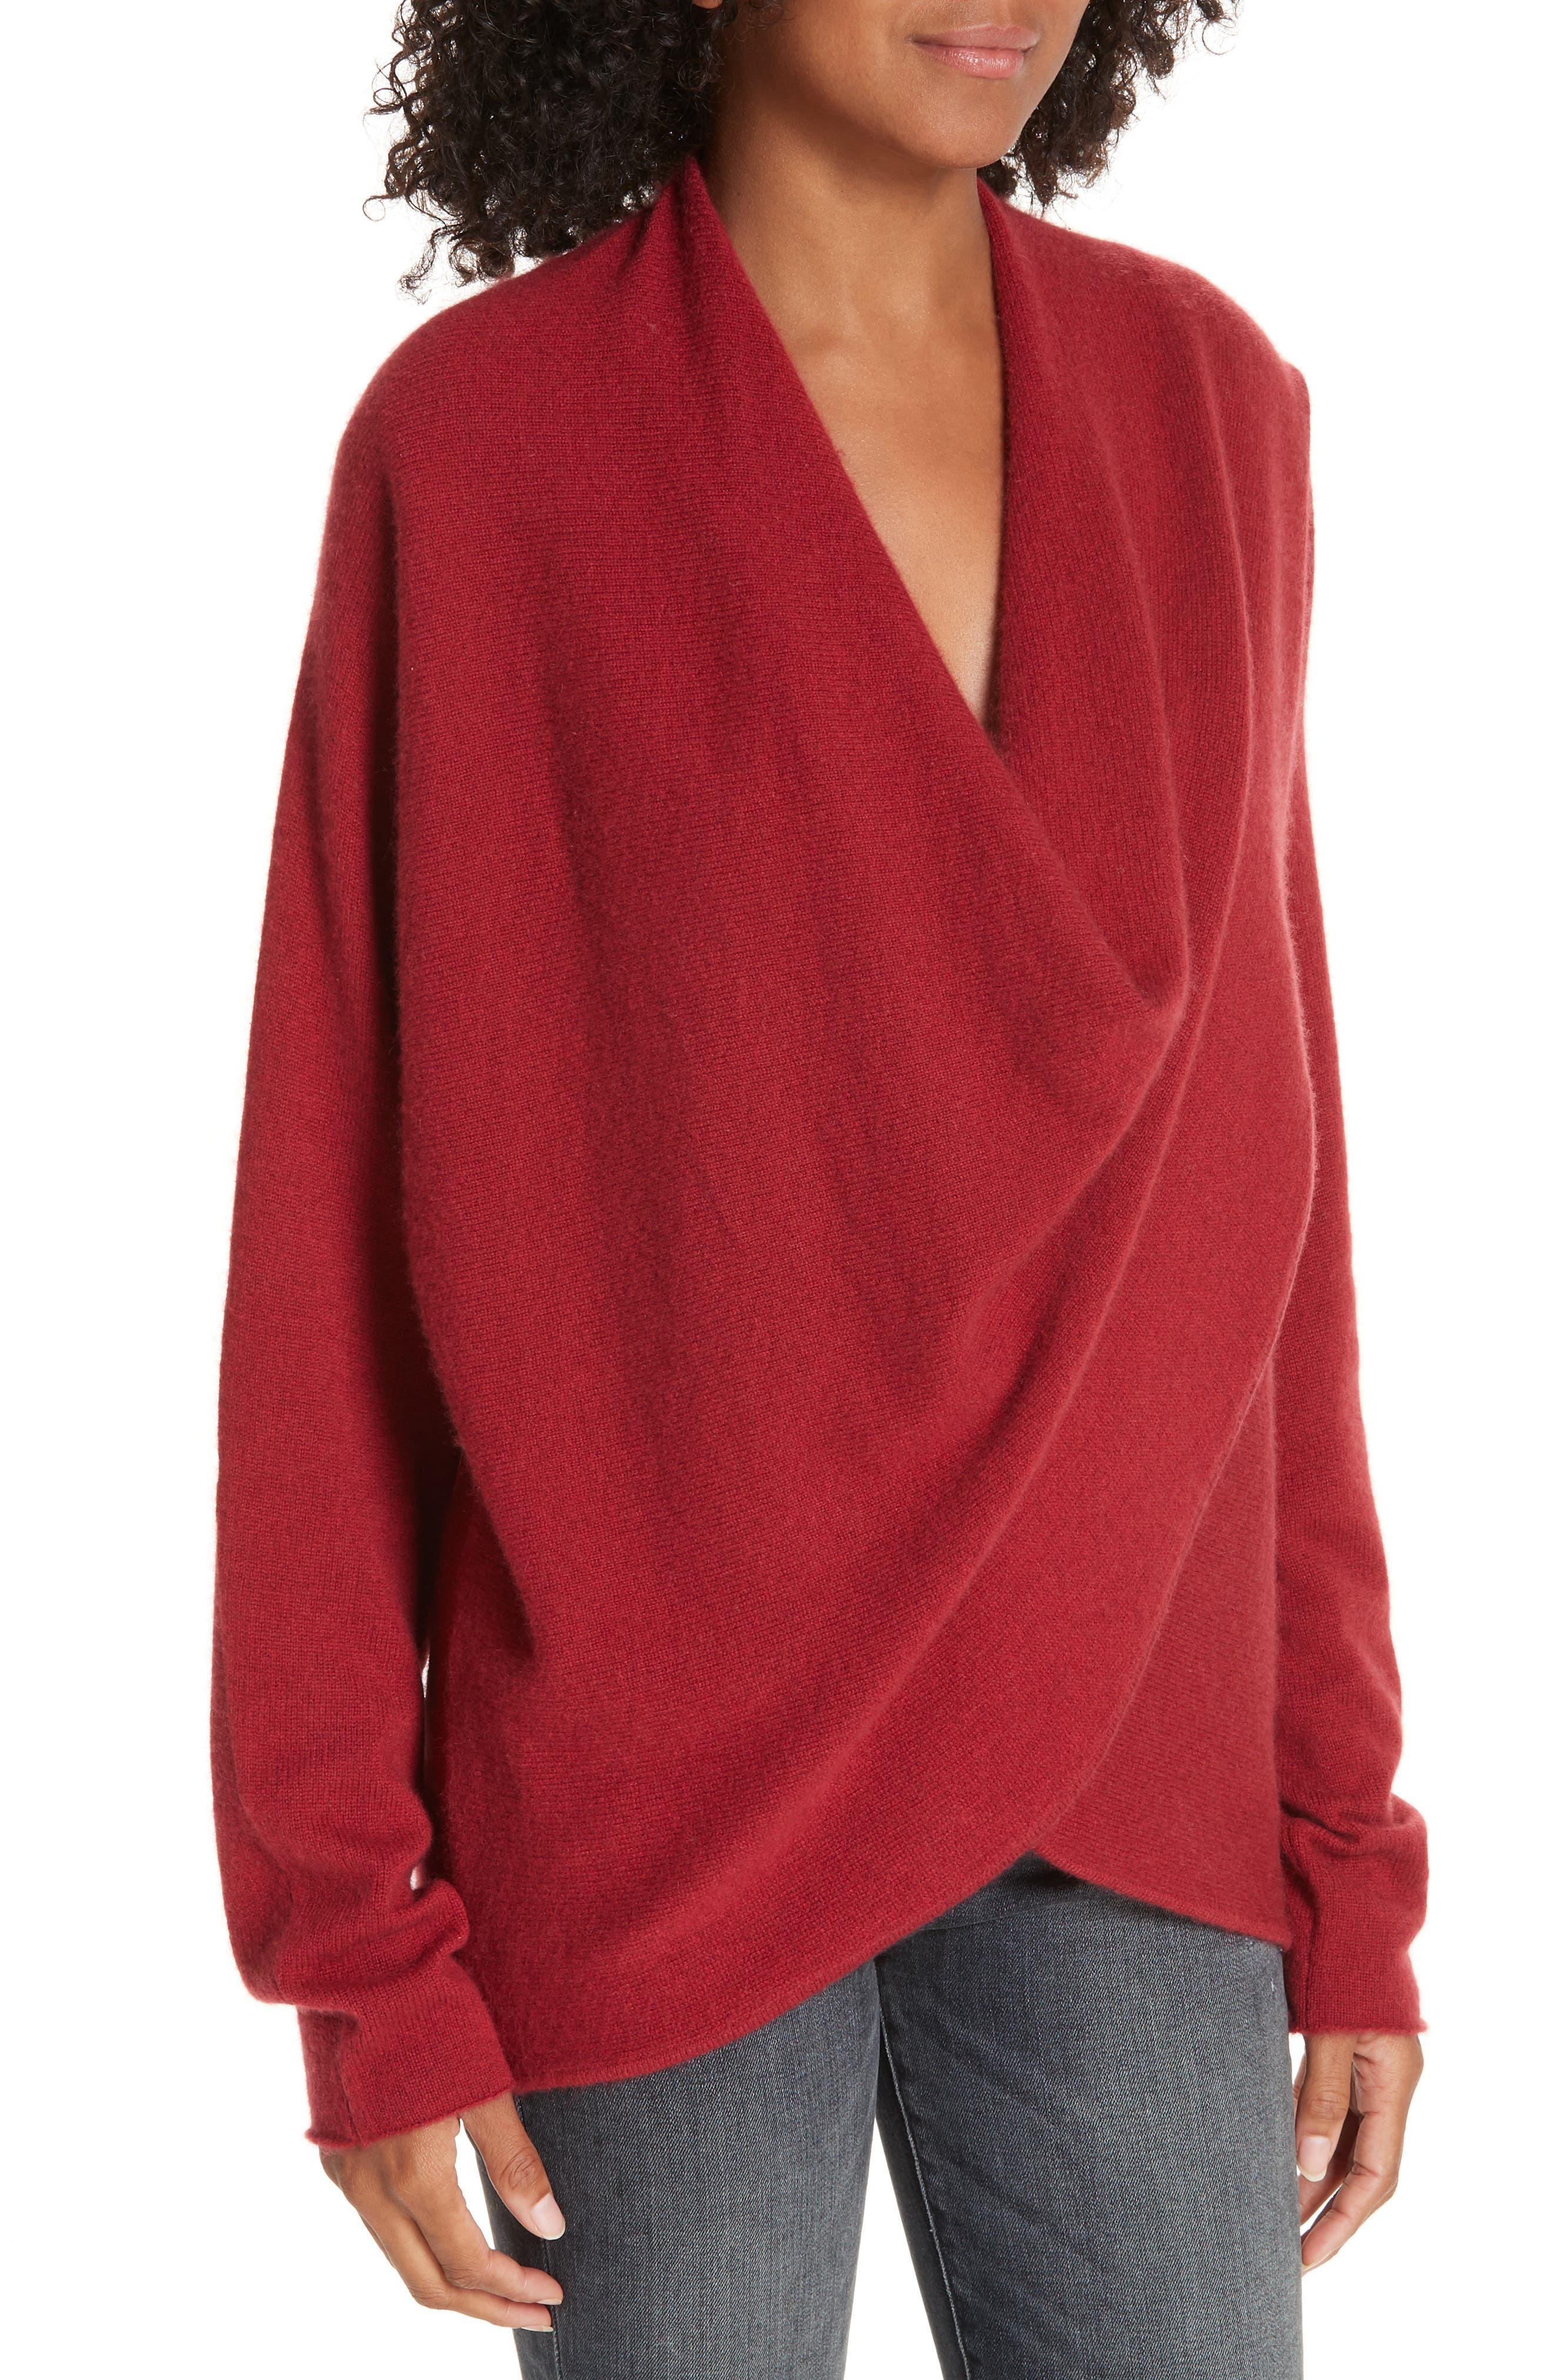 BROCHU WALKER,                             Clea Cashmere Wrap Sweater,                             Alternate thumbnail 4, color,                             TANGIER